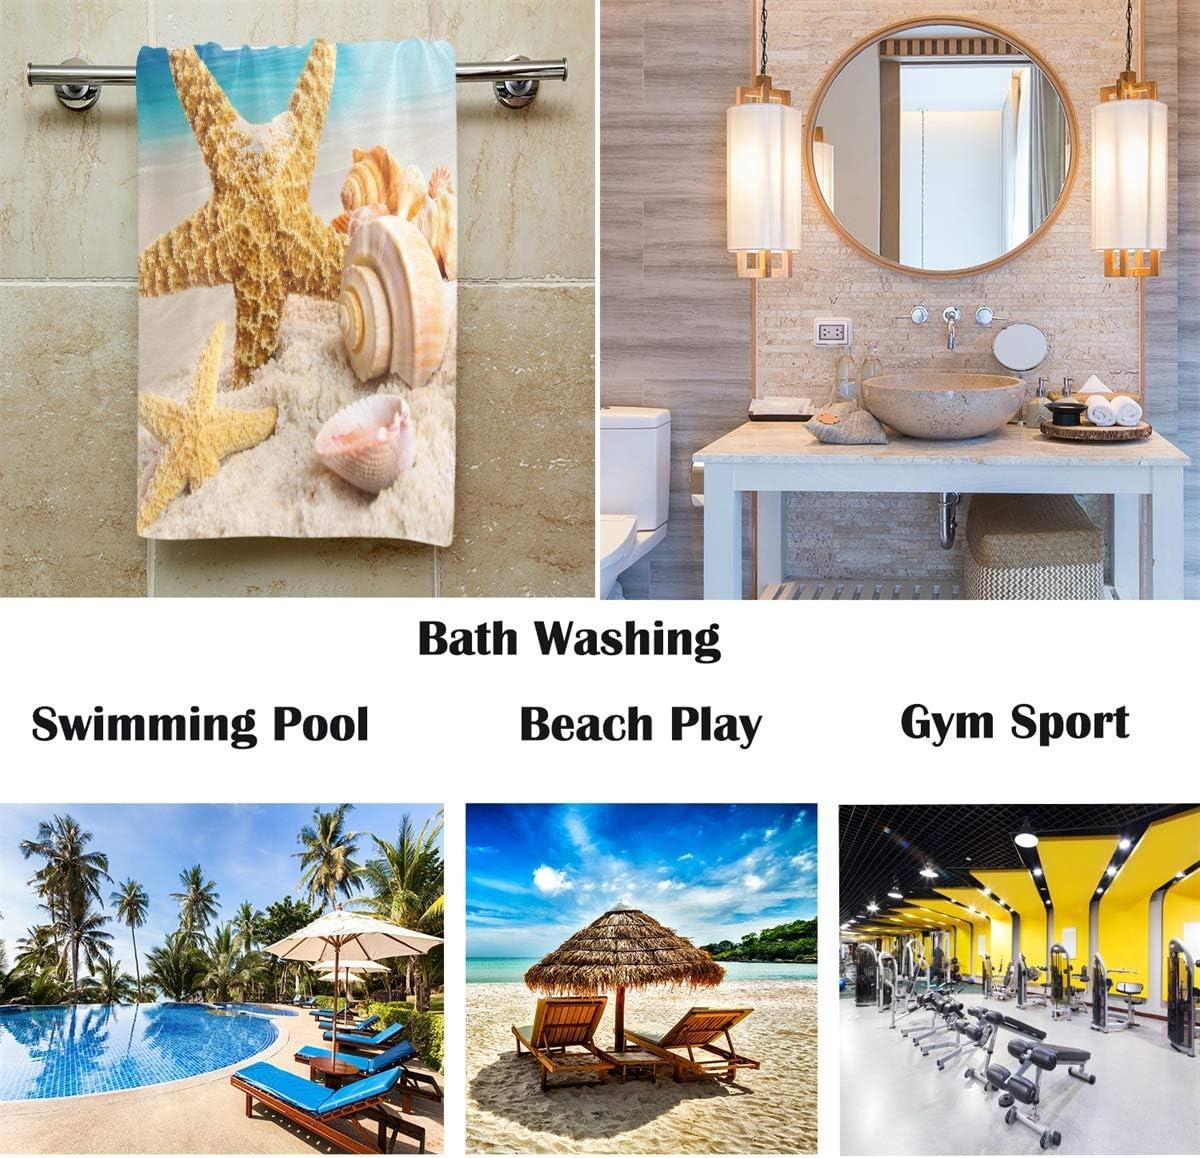 Pfrewn Starfish Seashells Beach Hand Towels 16x30in Bathroom Towel Ultra Soft Highly Absorbent Small Bath Towel Bathroom Decor Gifts Fingertip Towels Home Kitchen Fcteutonia05 De